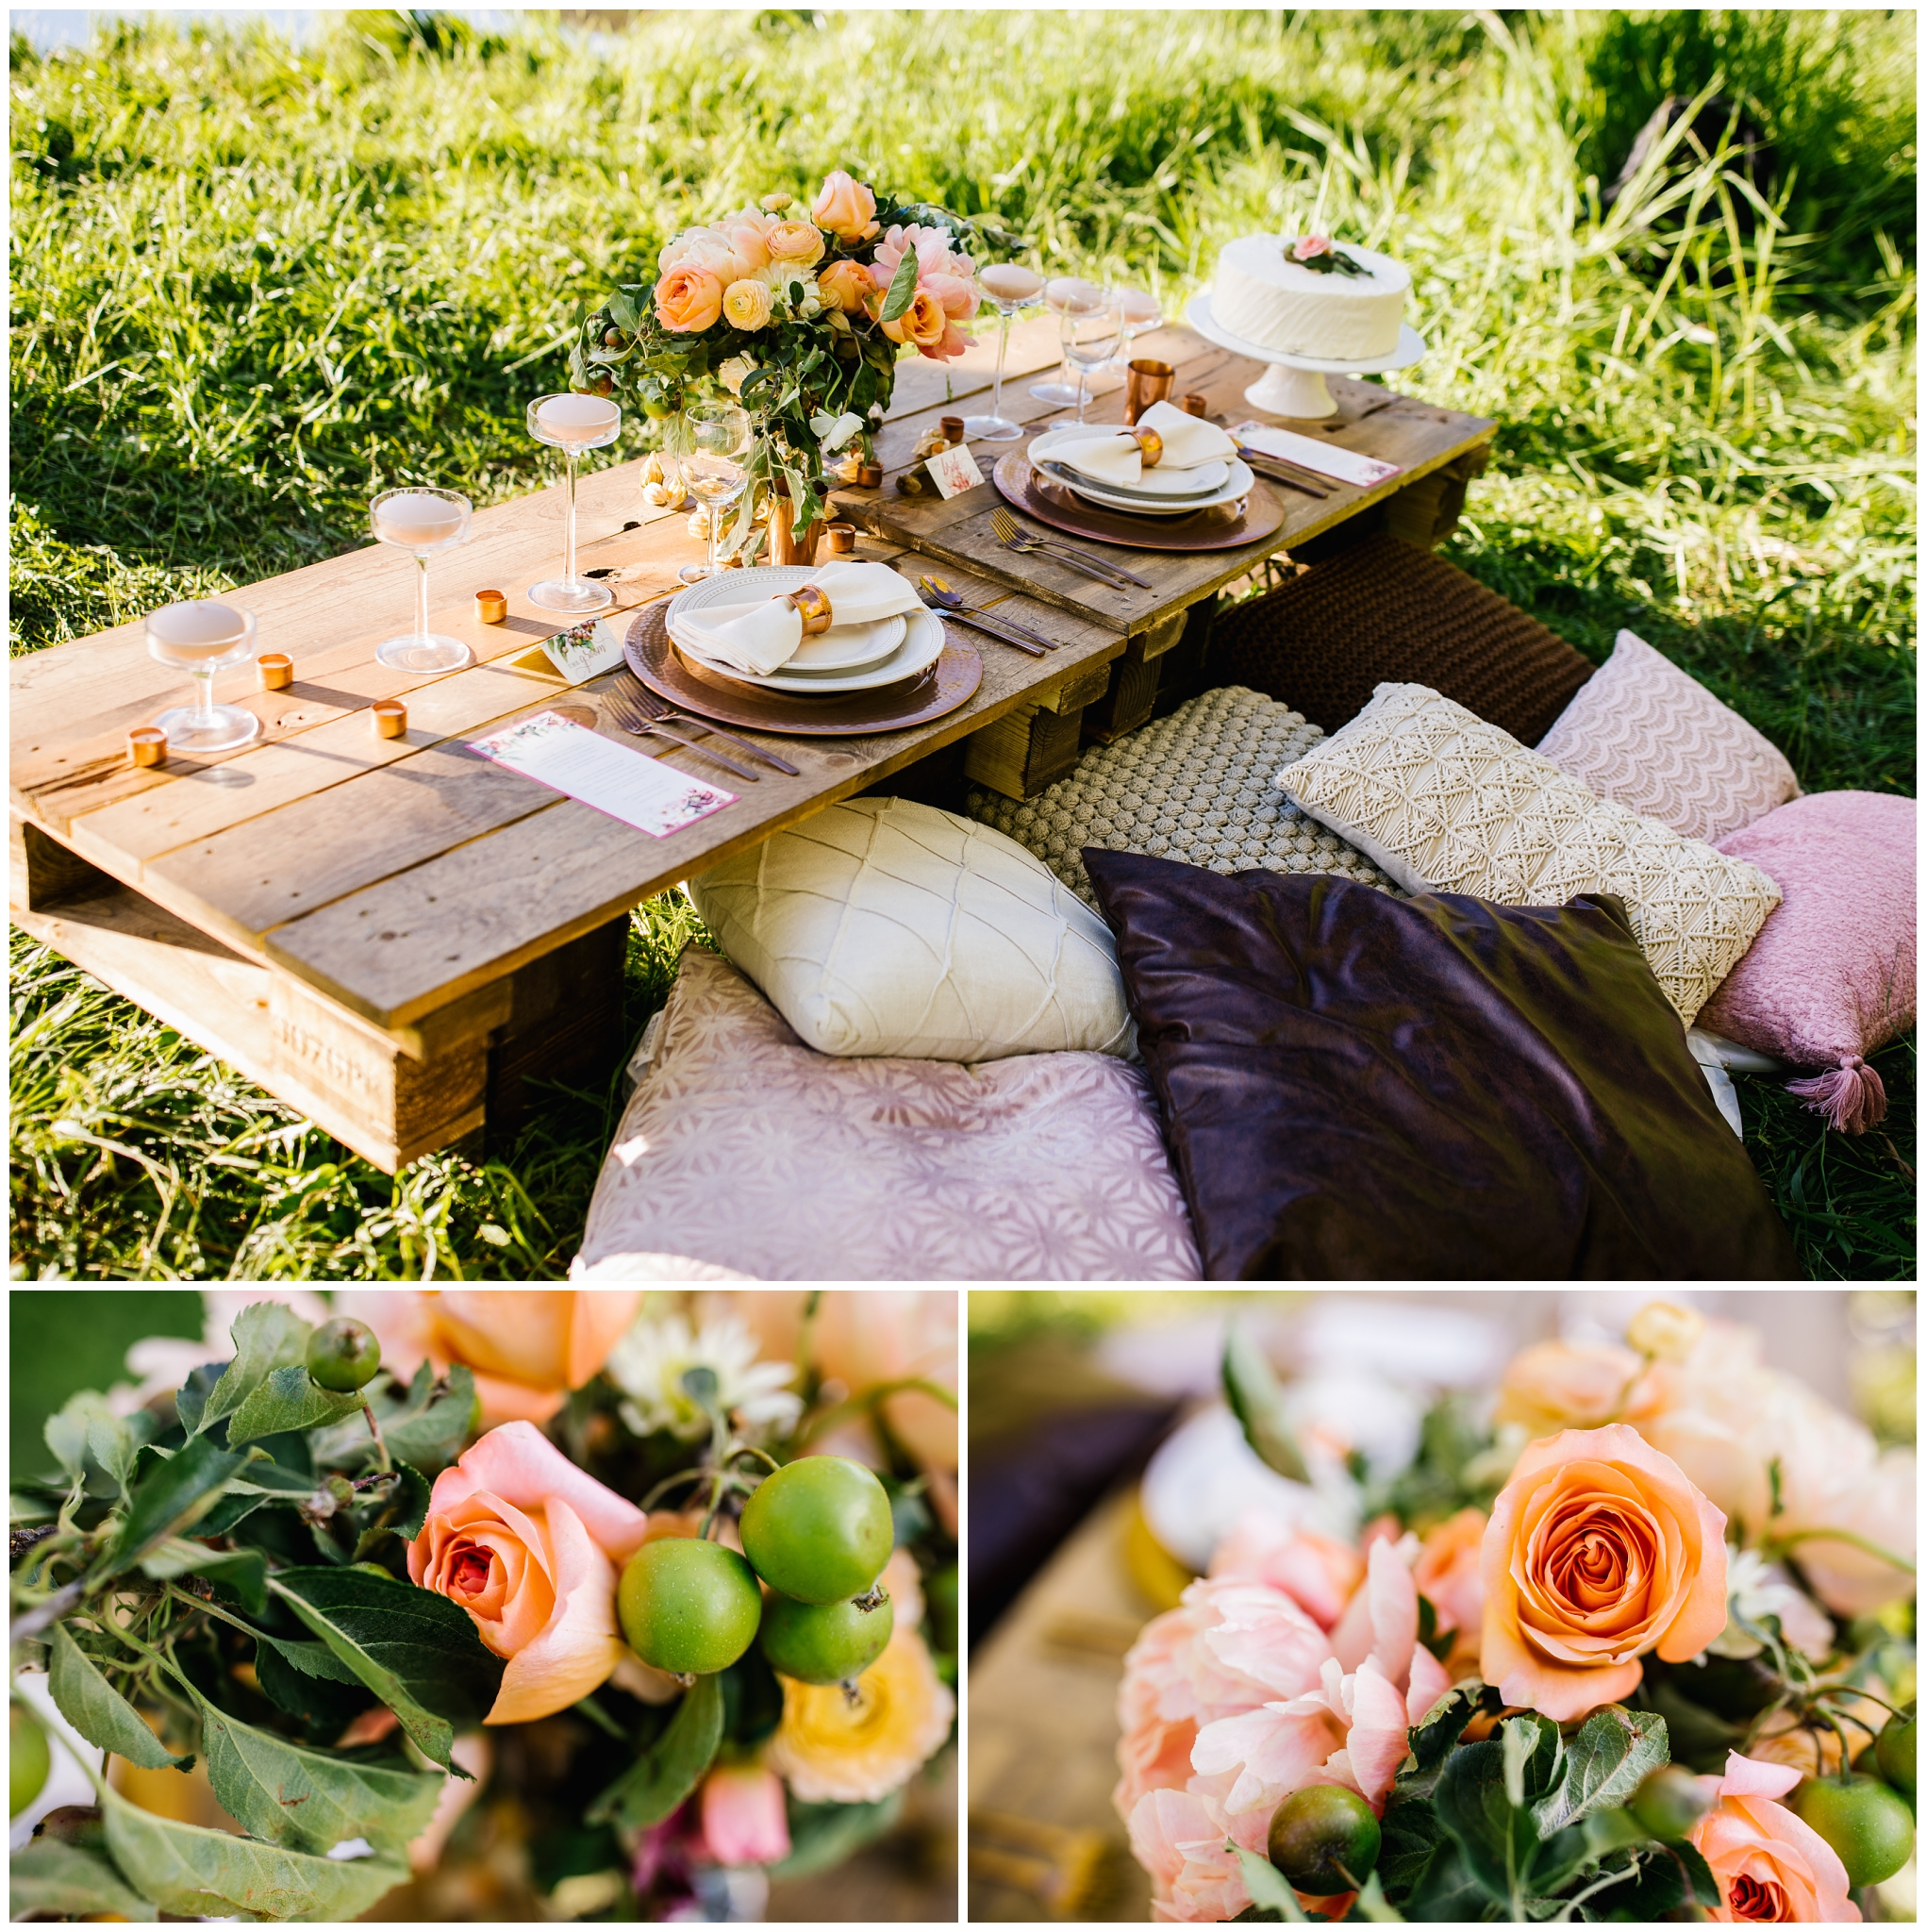 Lizzie-B-Imagery-Utah-Wedding-Photographer-Park-City-Photographer_0026.jpg